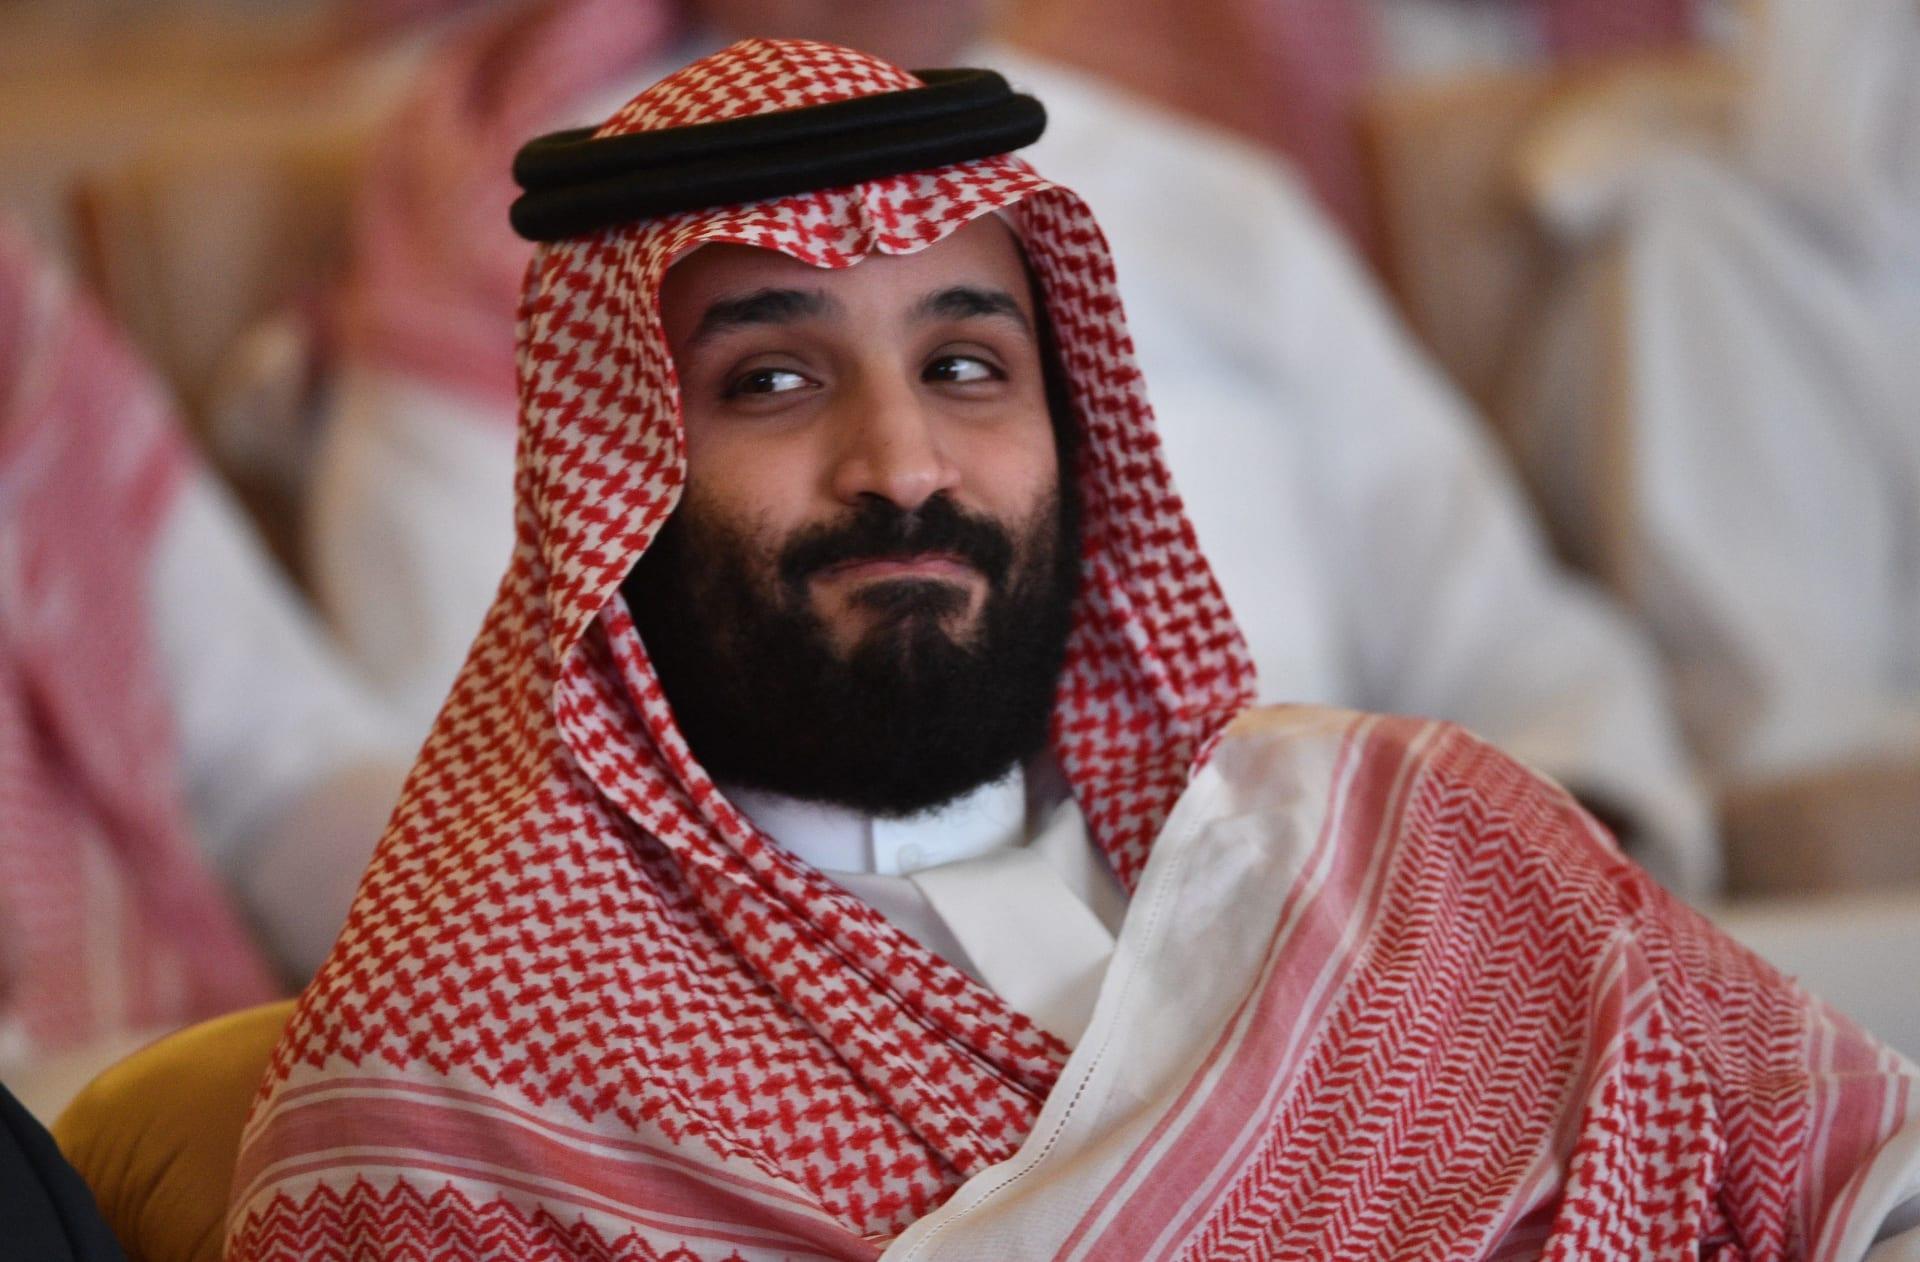 PBS: محمد بن سلمان يصرح بتحمله مسؤولية مقتل خاشقجي وينفي تدخله